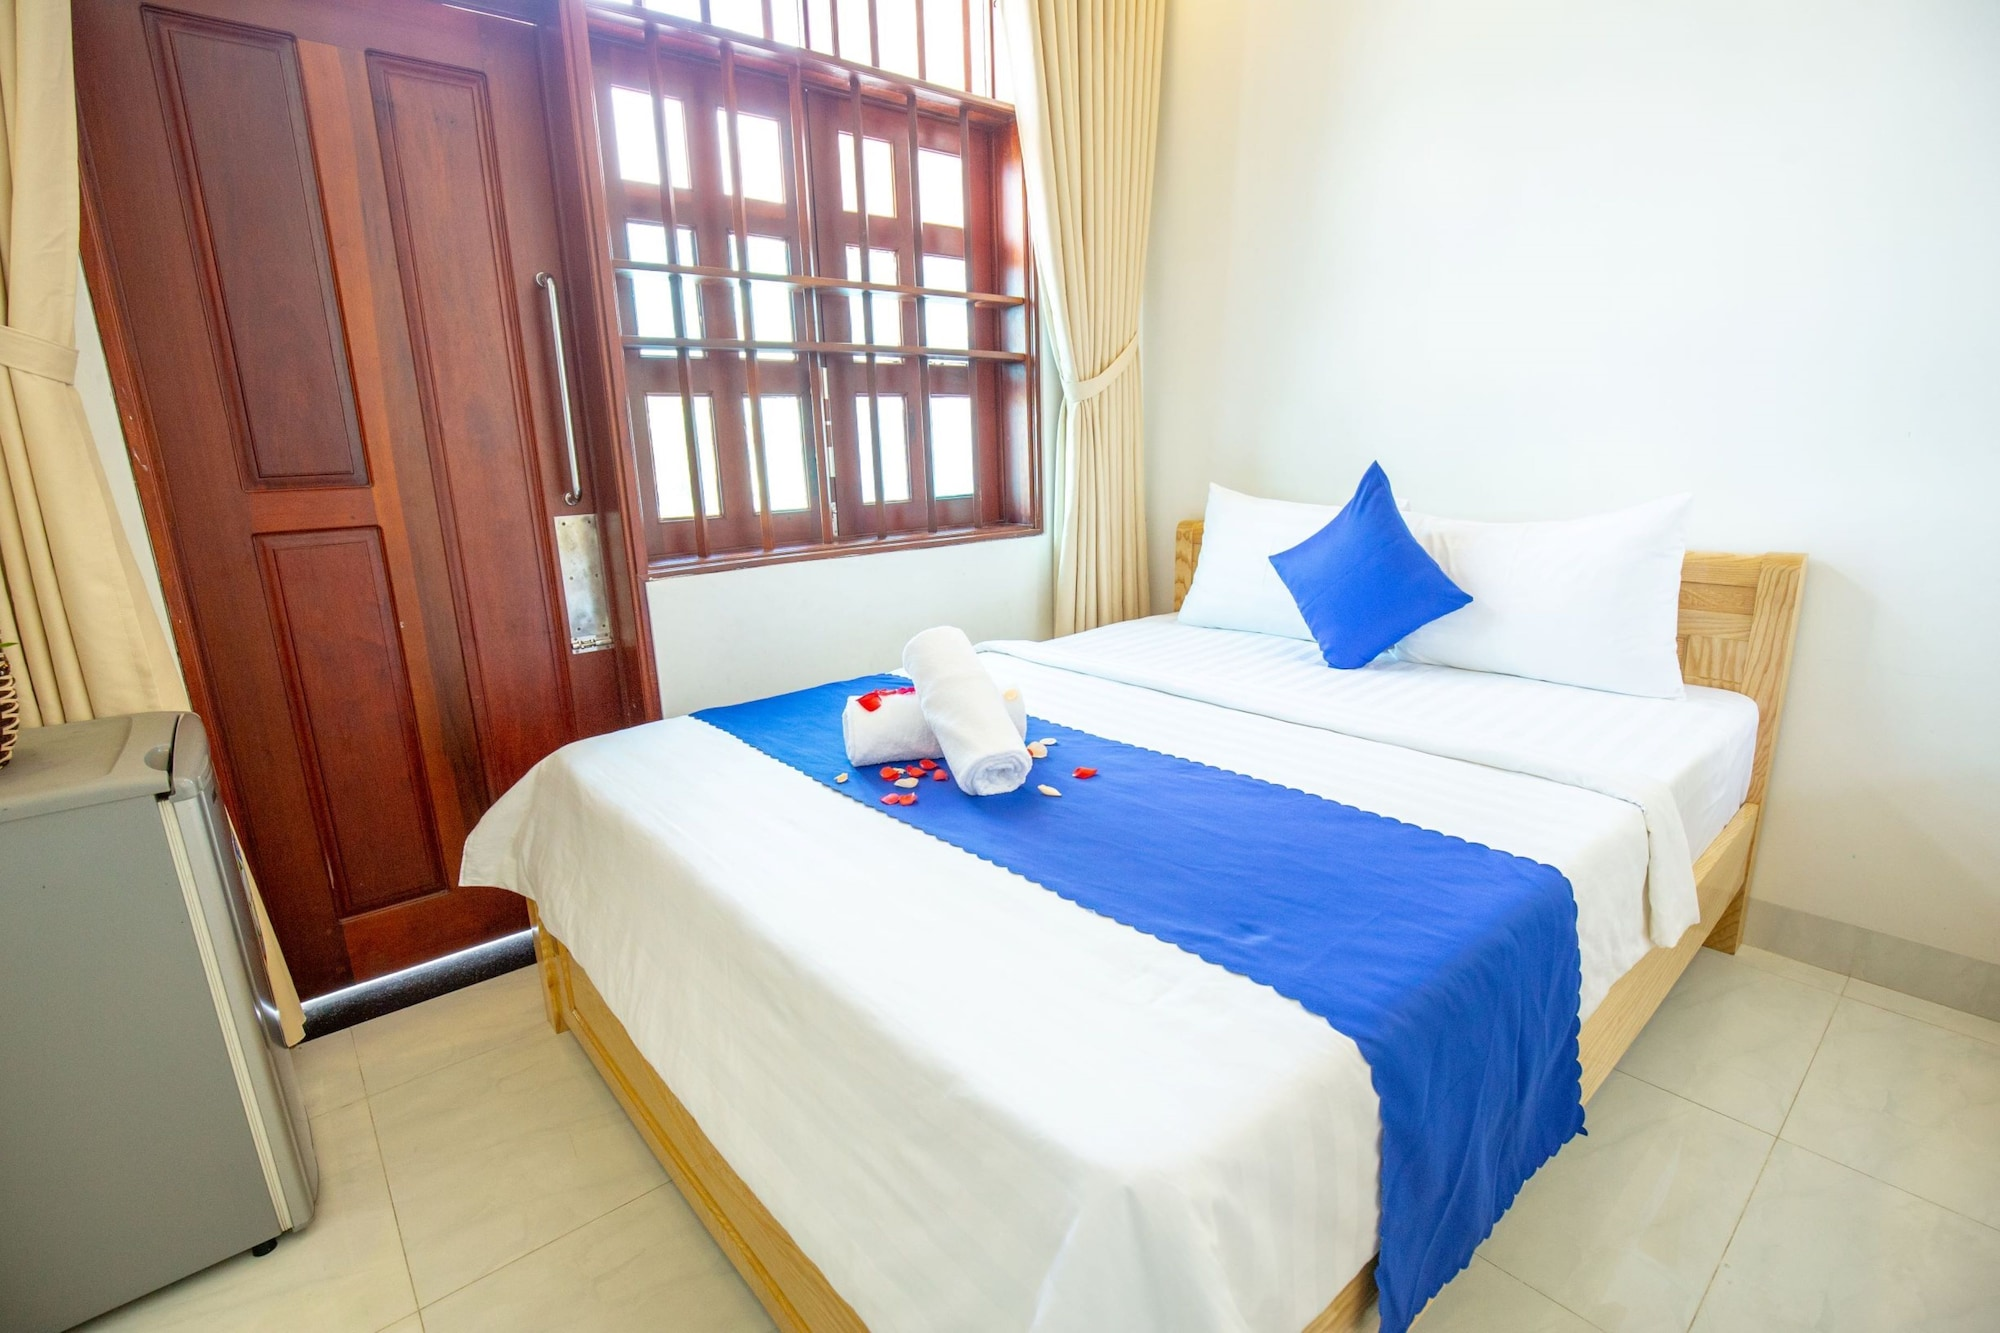 TiMee Hotel & Apartment, Nha Trang